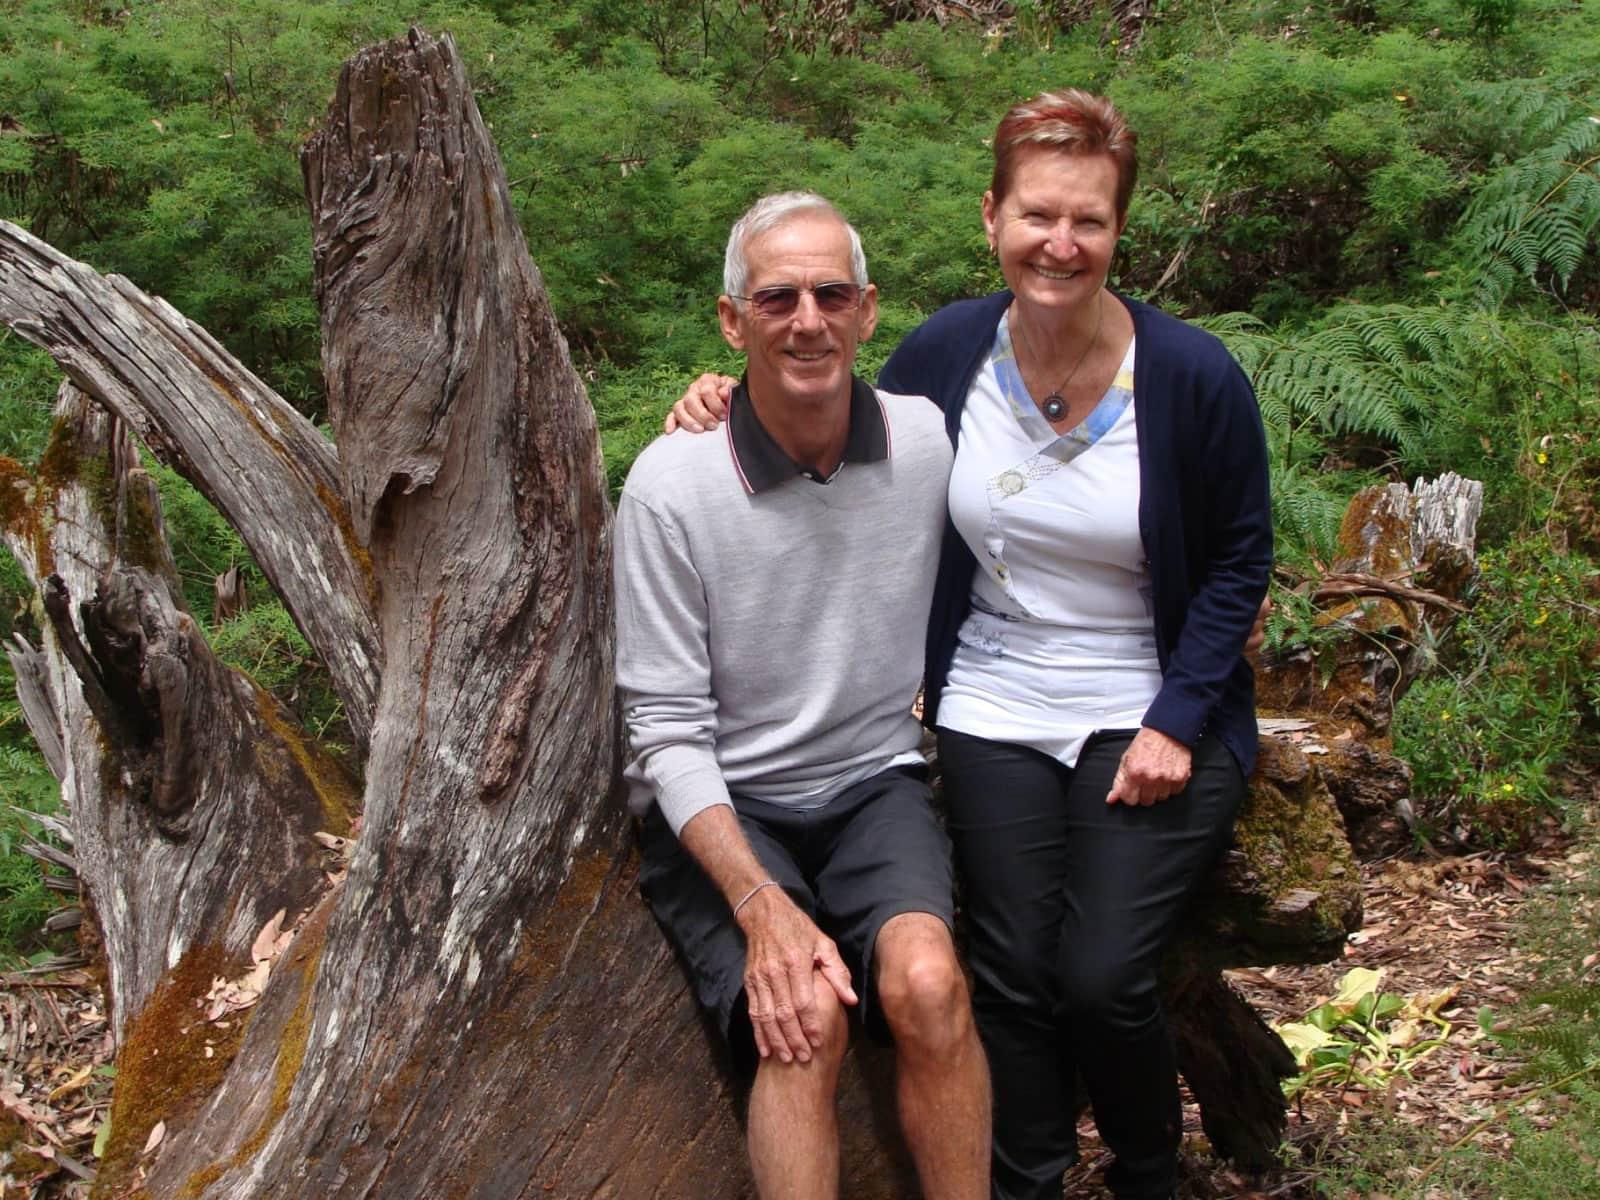 Nancy & Gerry from Margaret River, Western Australia, Australia